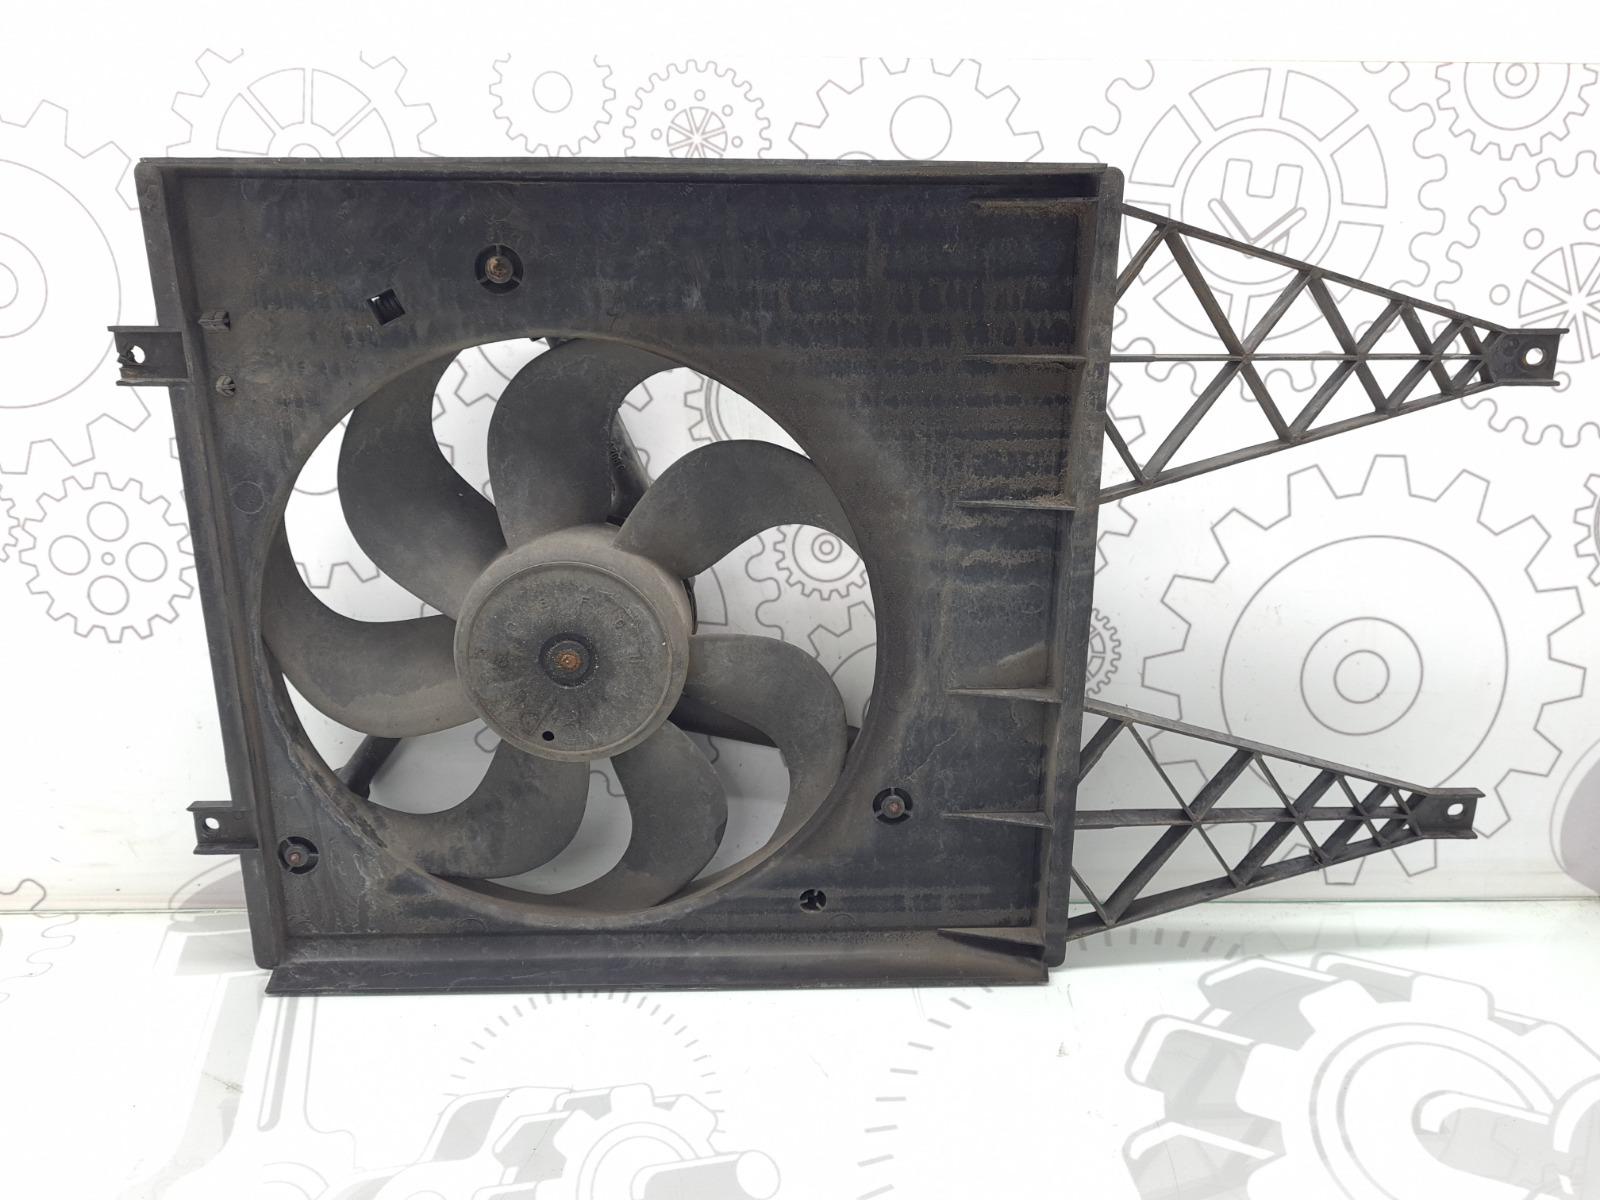 Вентилятор радиатора Skoda Fabia 1.9 SDI 2003 (б/у)